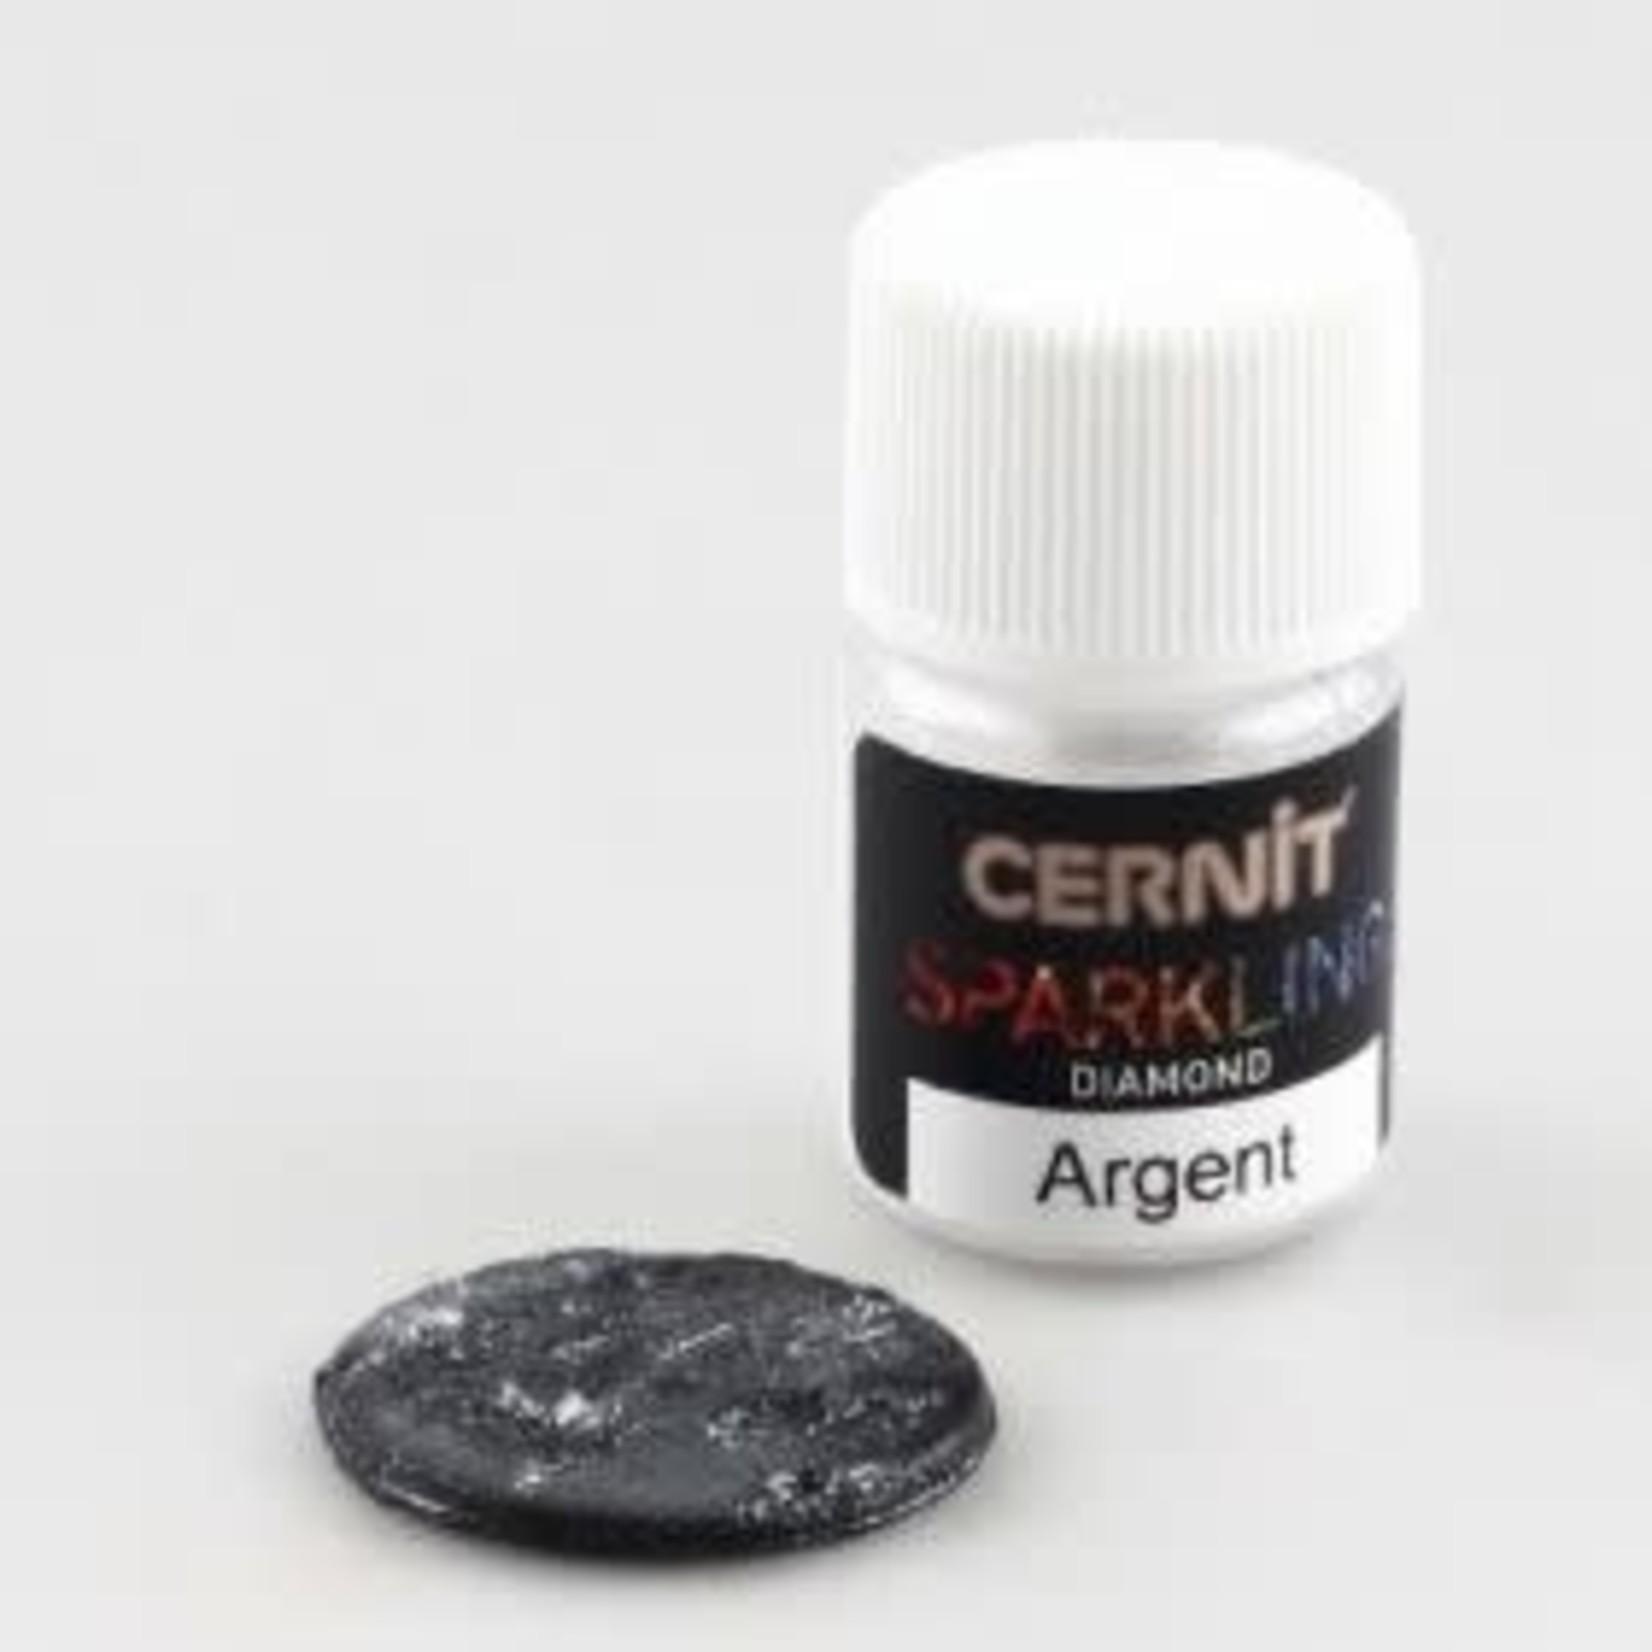 Cernit Cernit Sparkling Diamond Silver 5 Gr